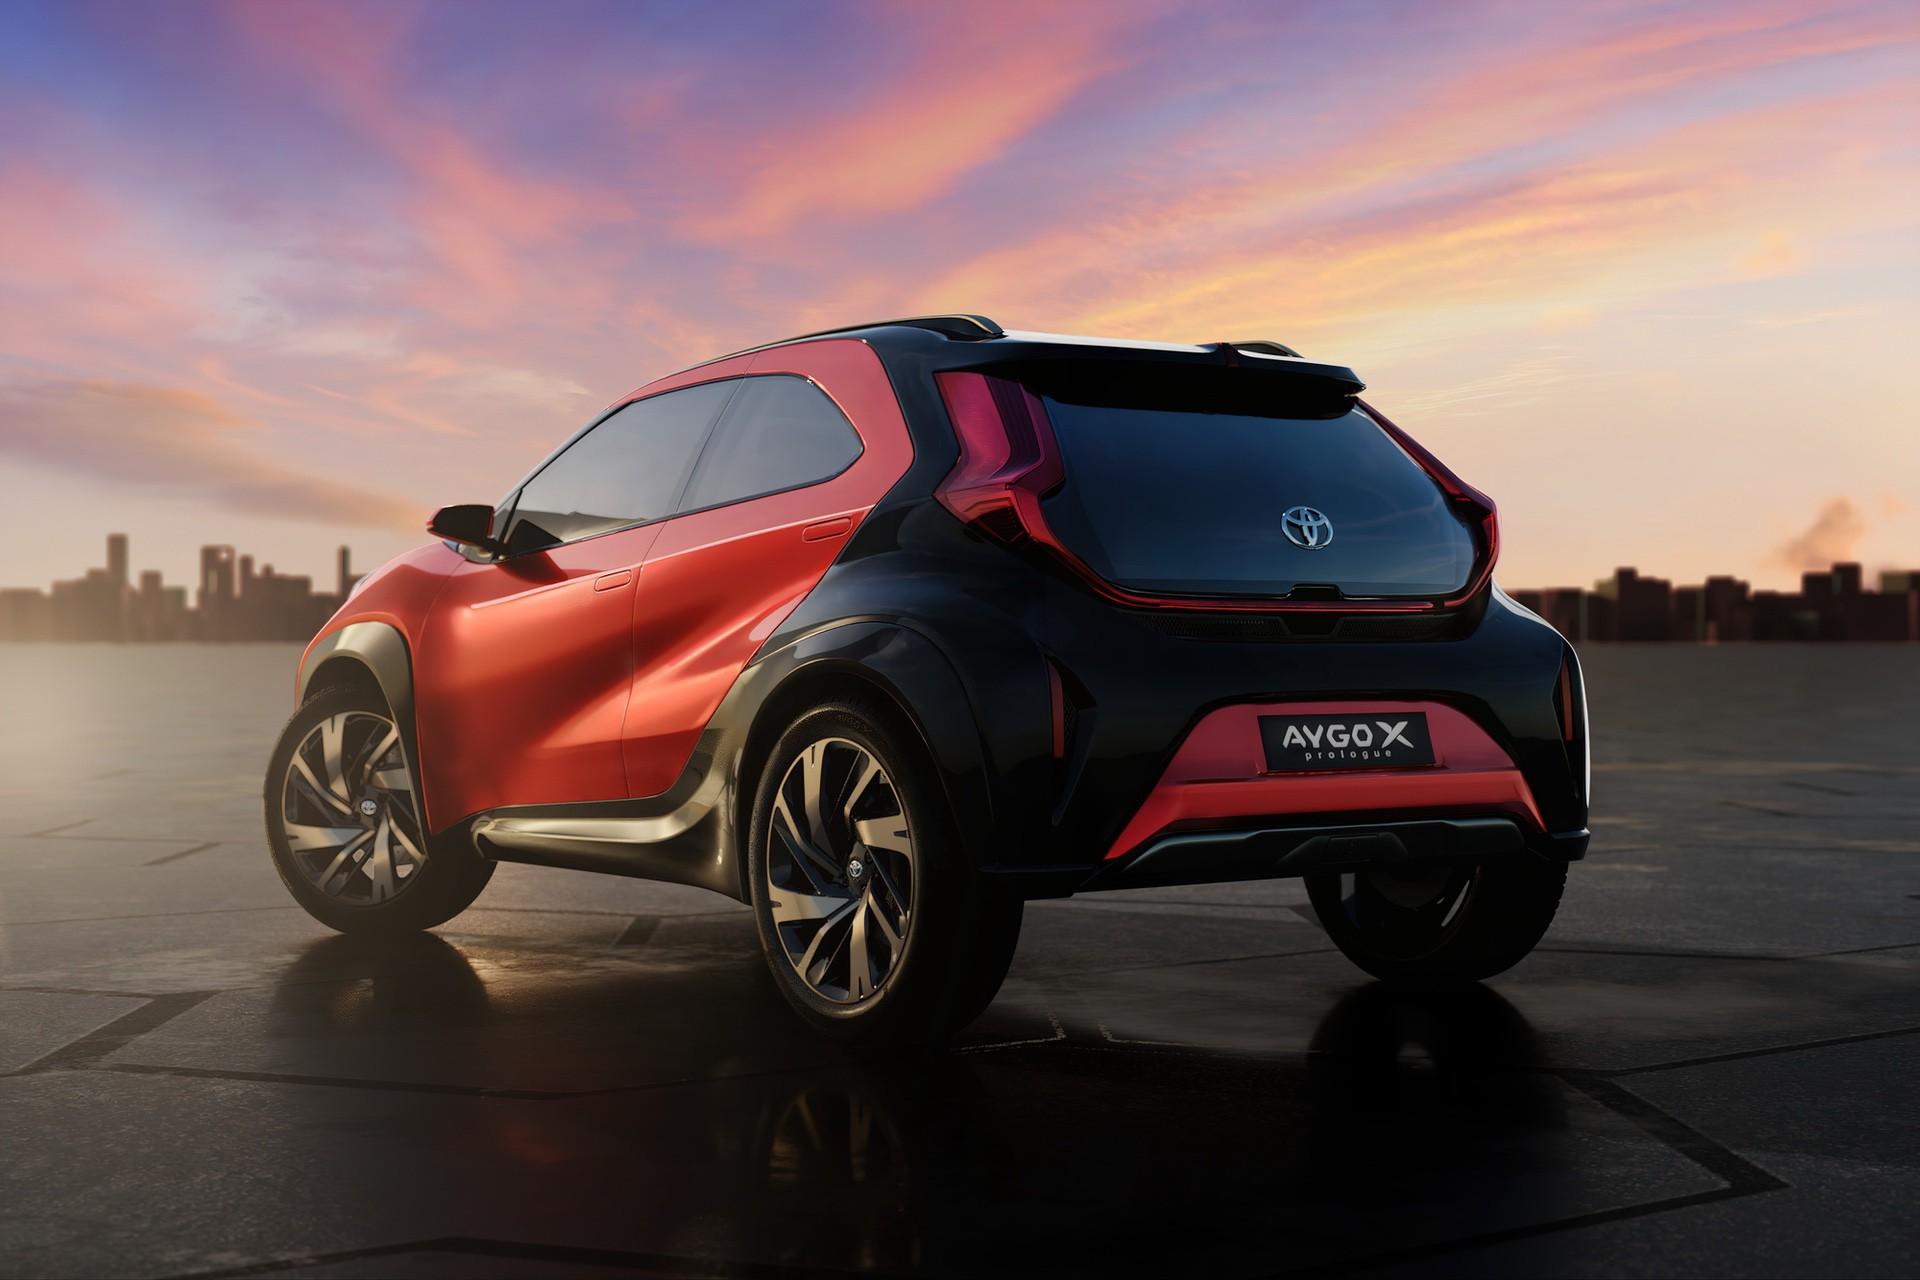 Toyota_Aygo_X_prologue-0012